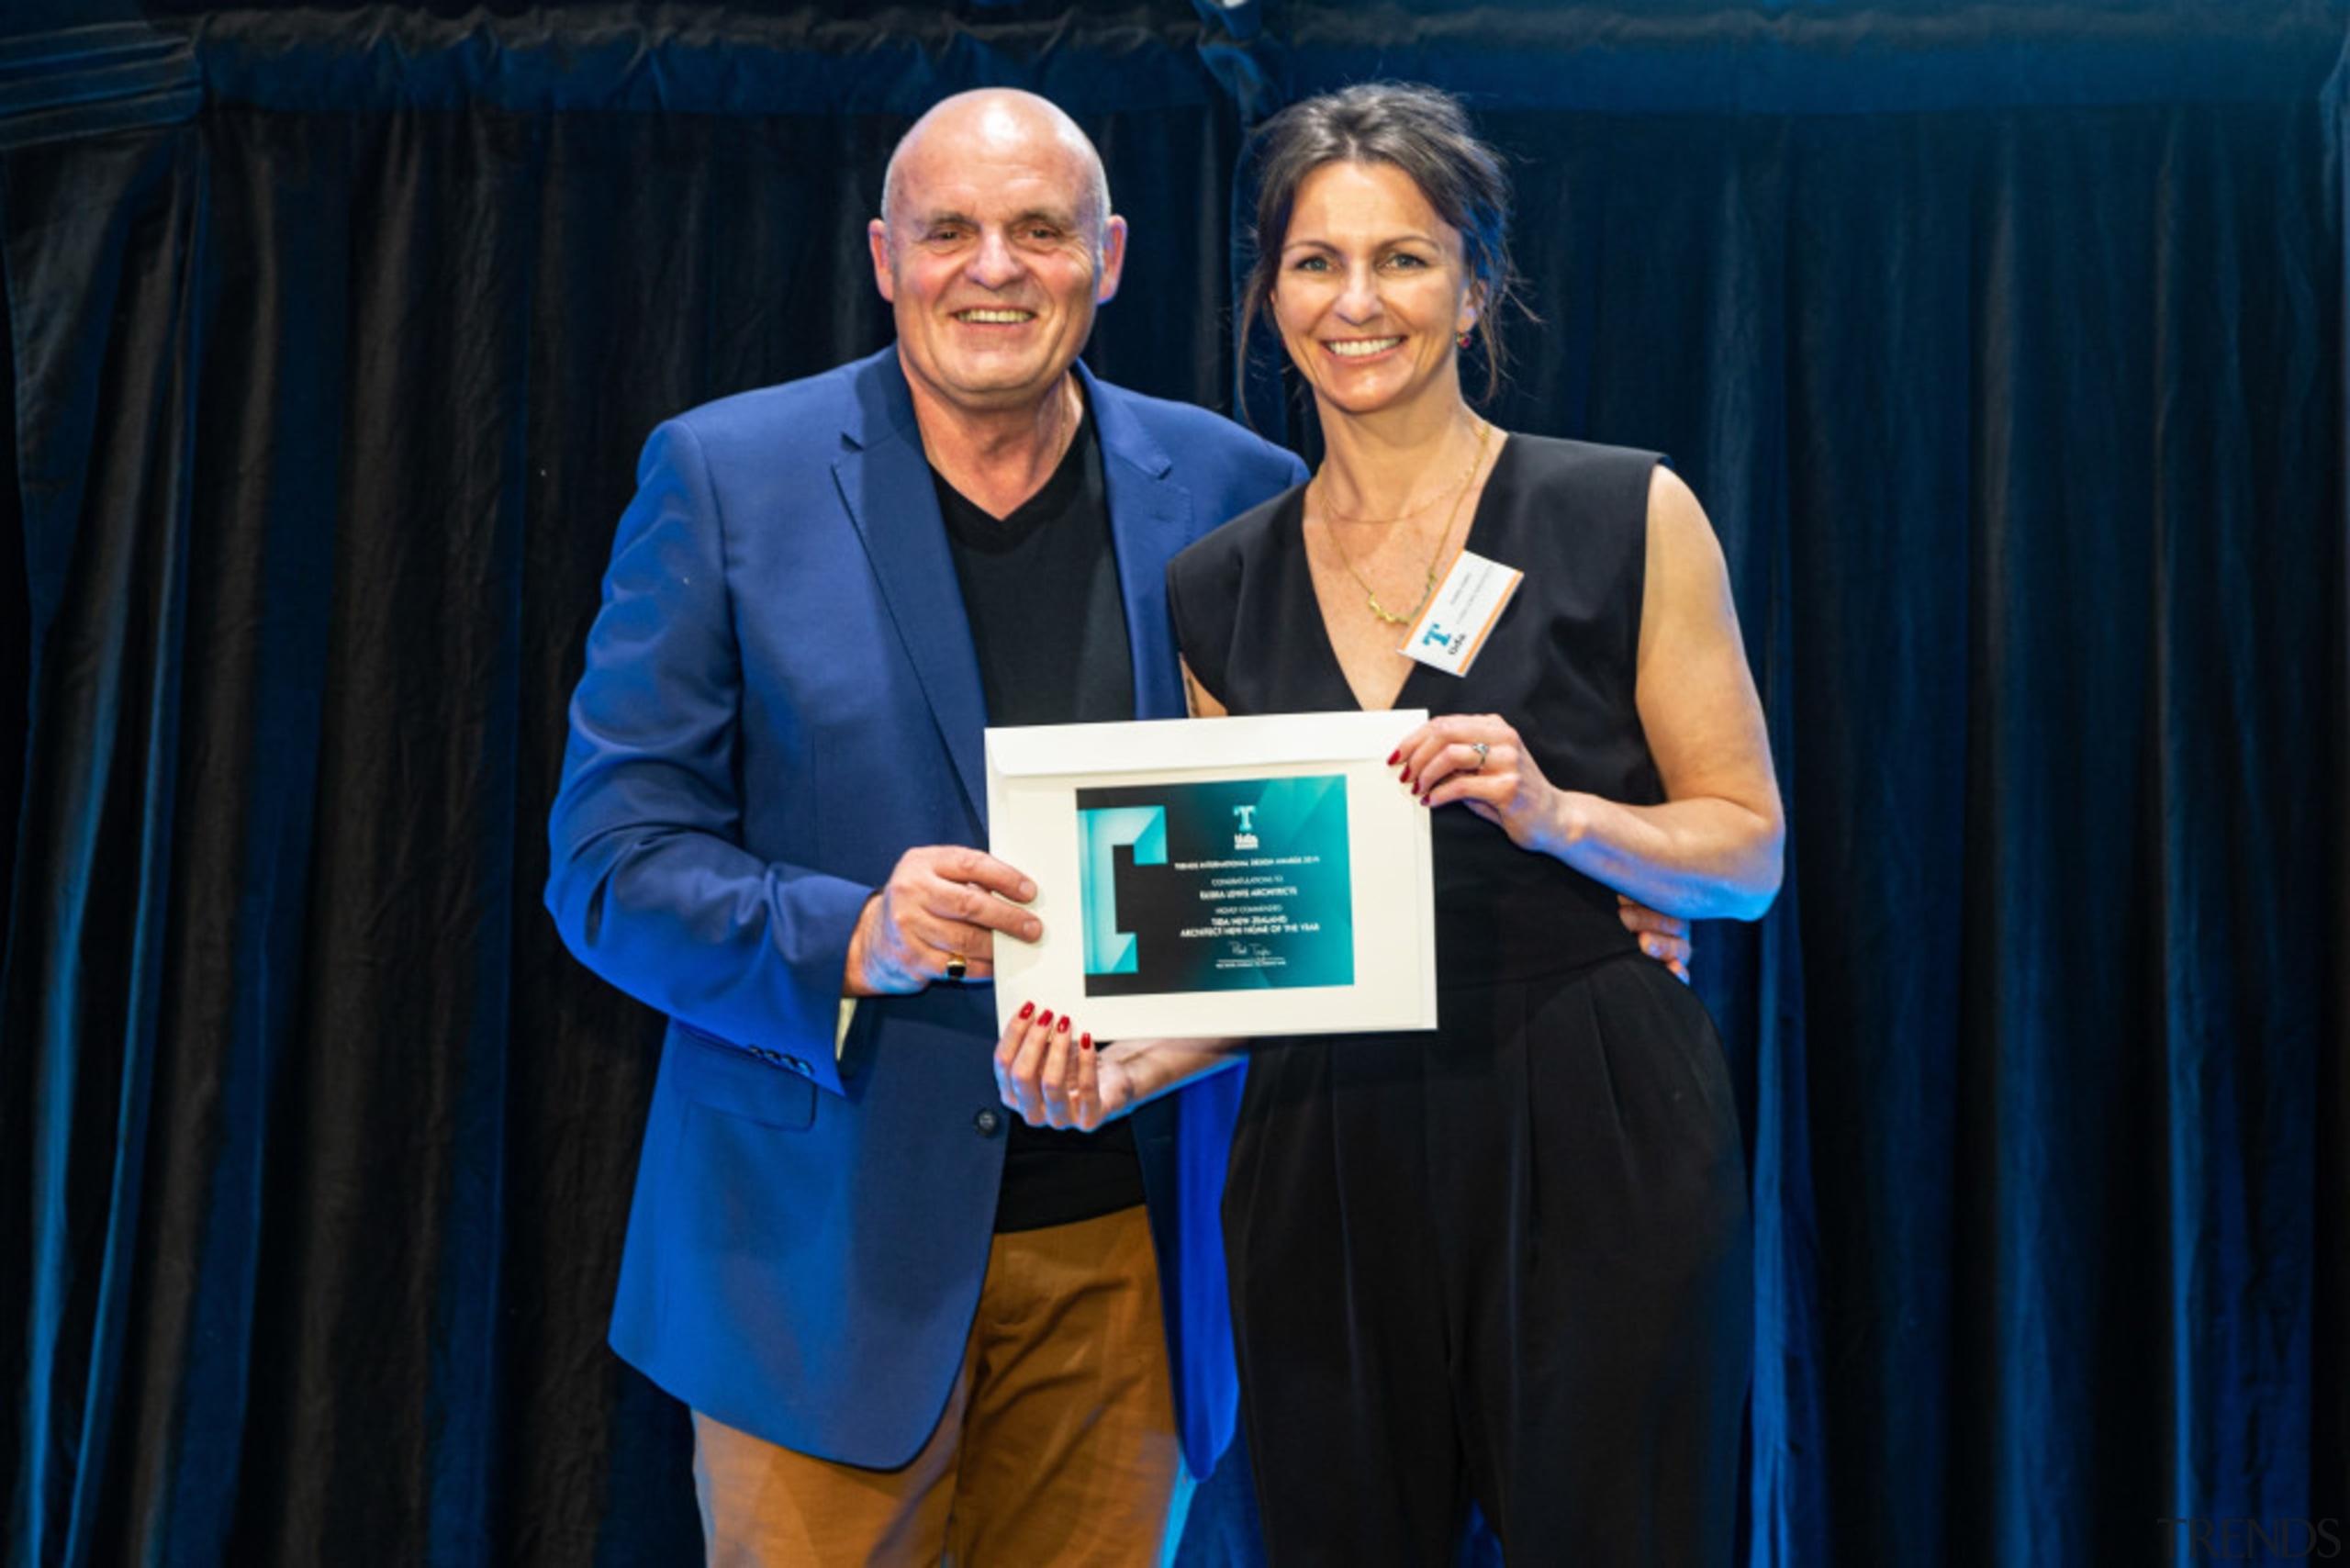 2019 TIDA New Zealand Homes presentation evening award, award ceremony, blue, employment, event, blue, black